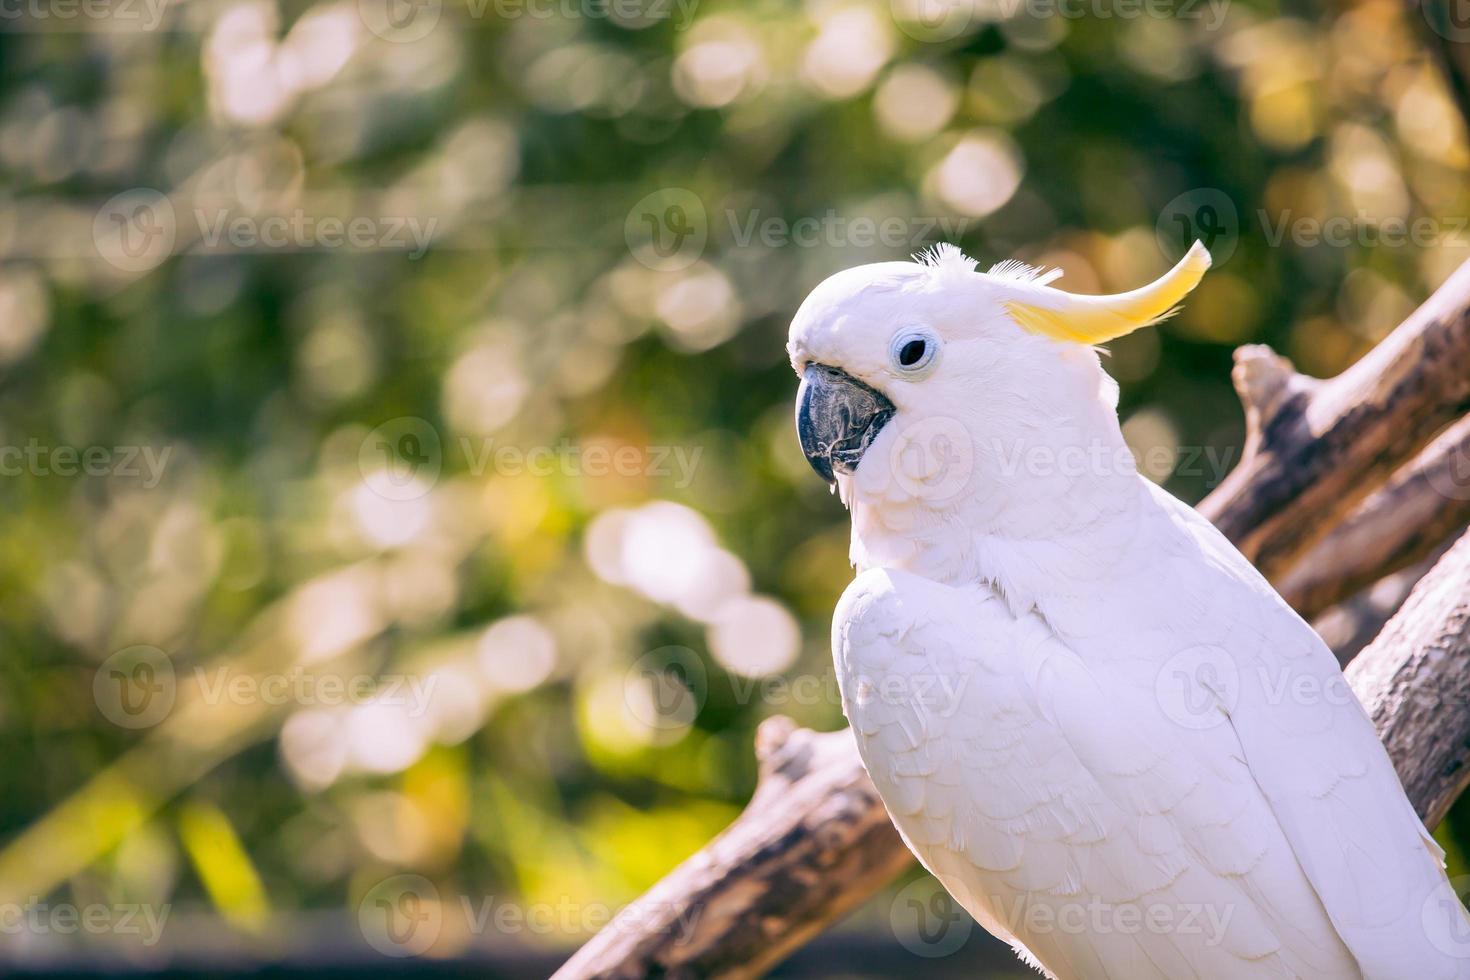 Cerca de cacatúa de cresta amarilla con fondo de follaje borroso foto